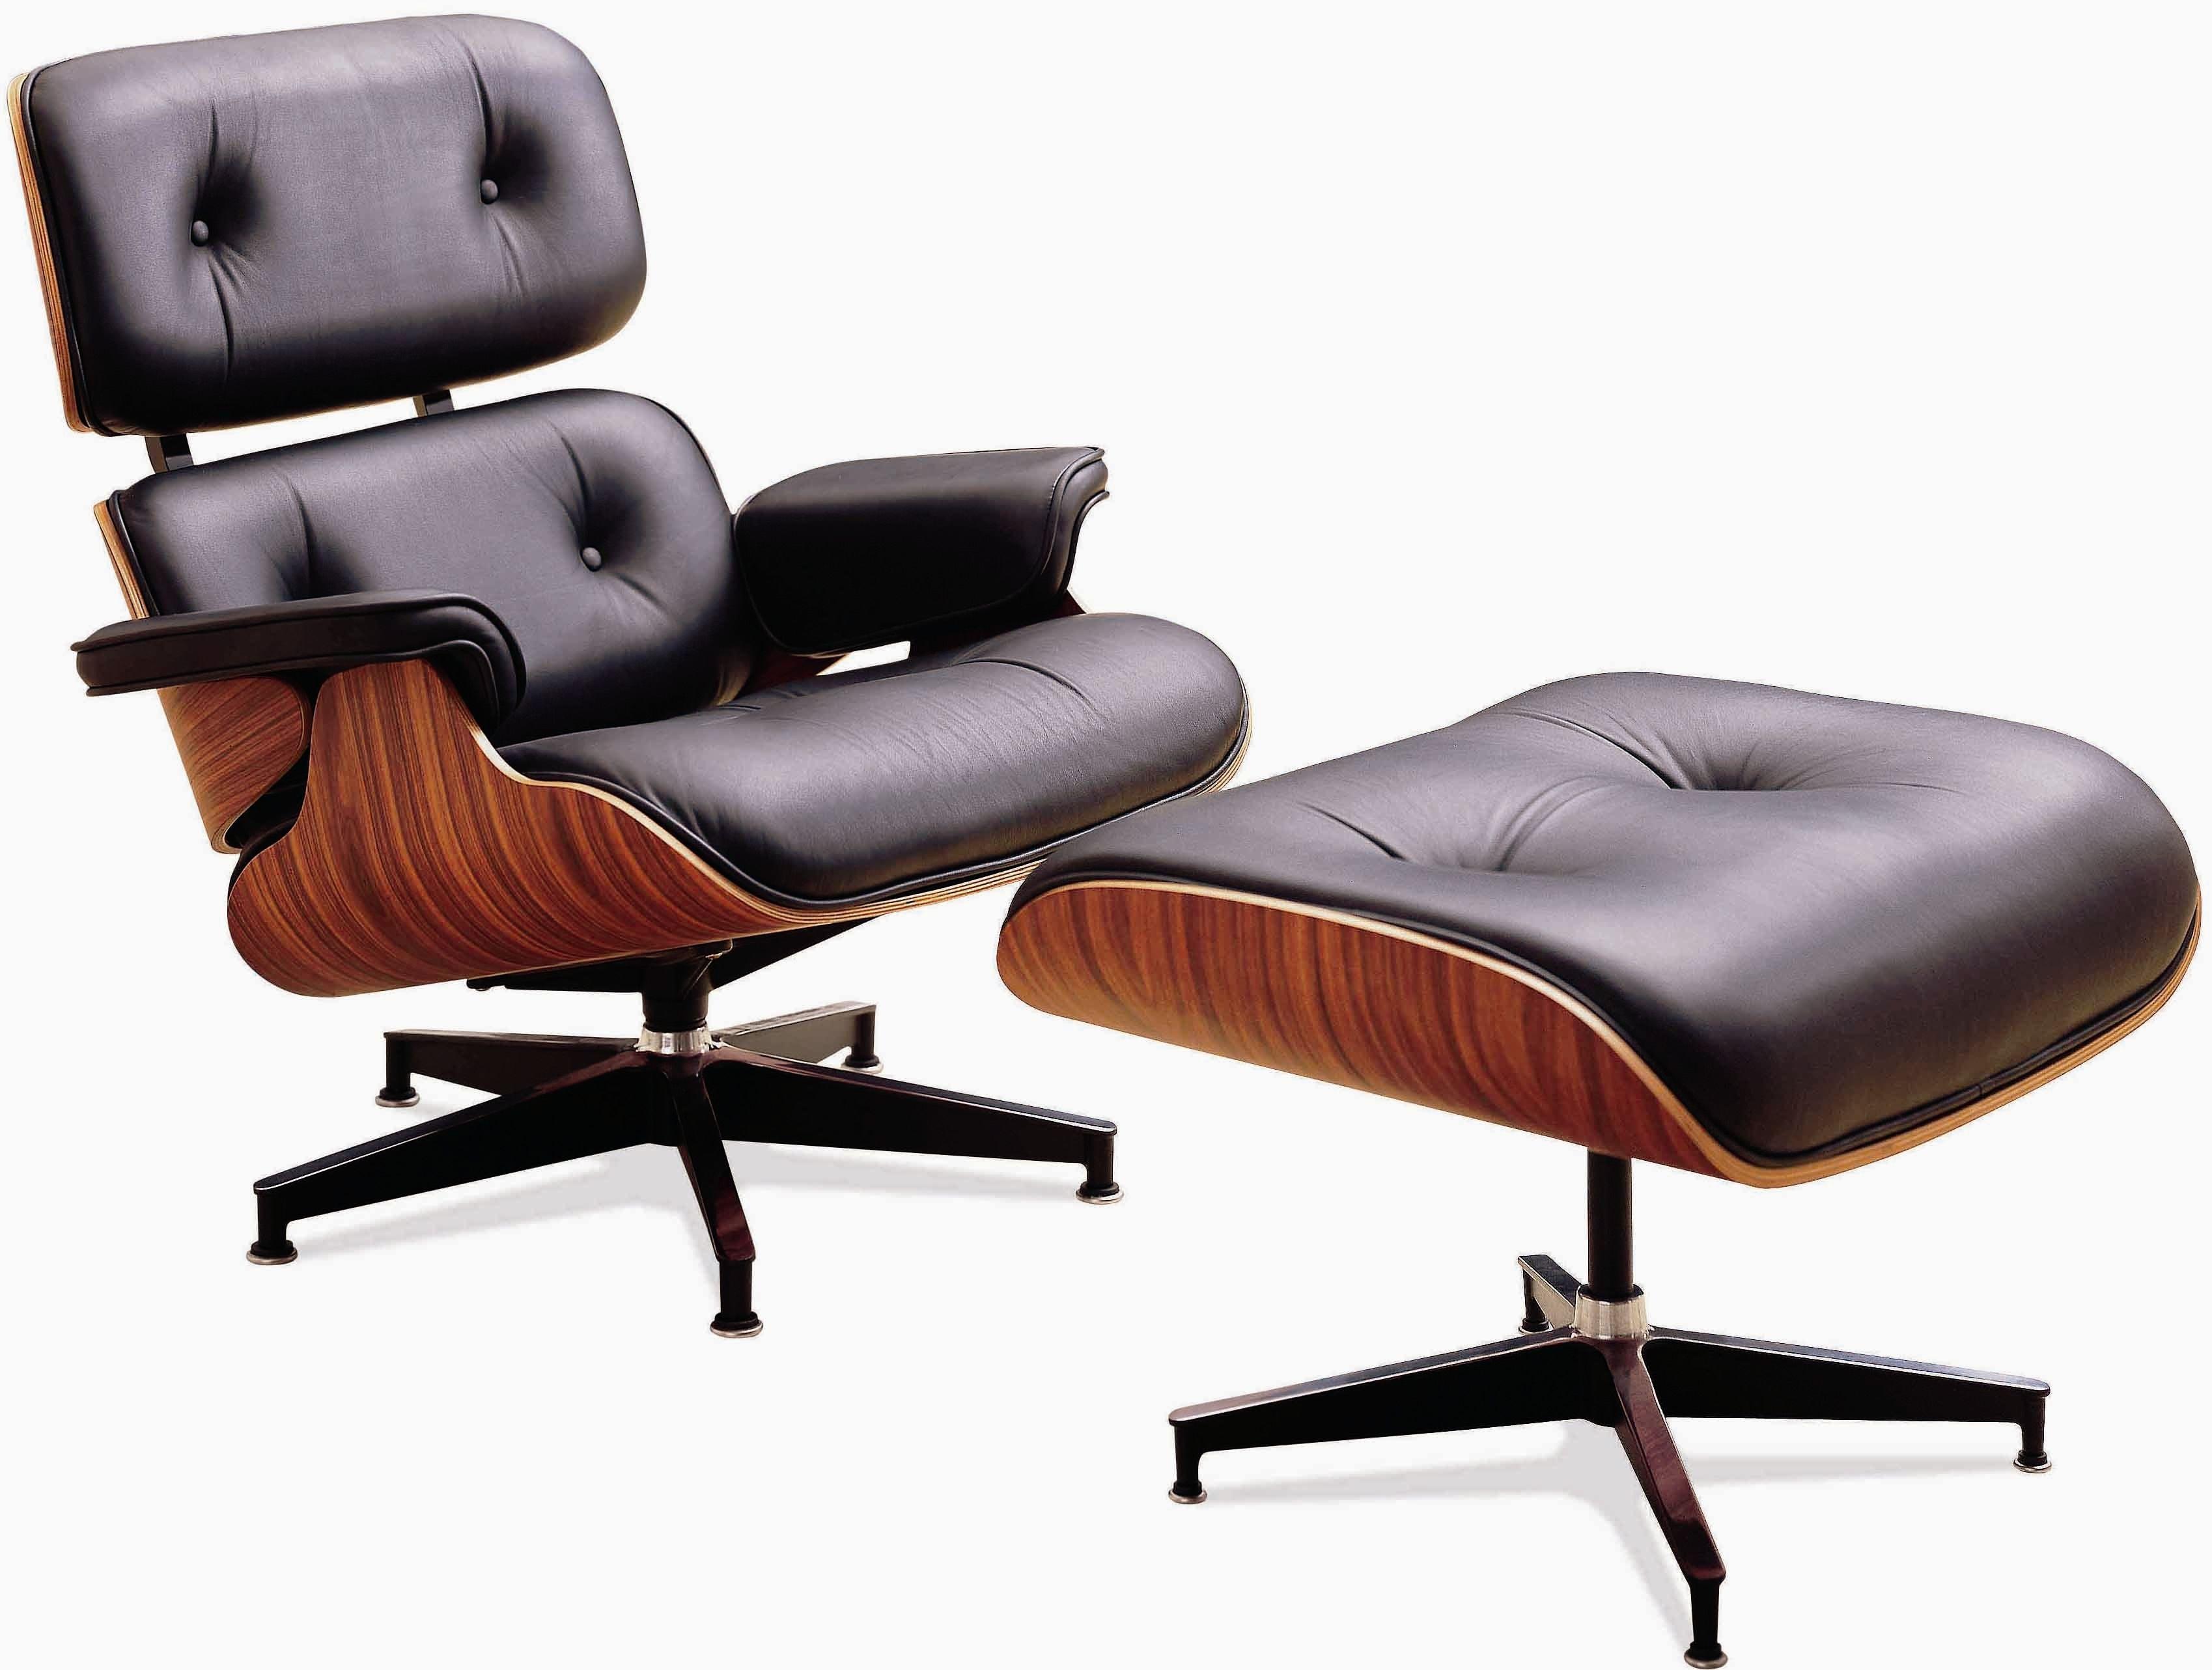 The Dr Eam Es Chair The Place Where I Ll Write My Memoirs One